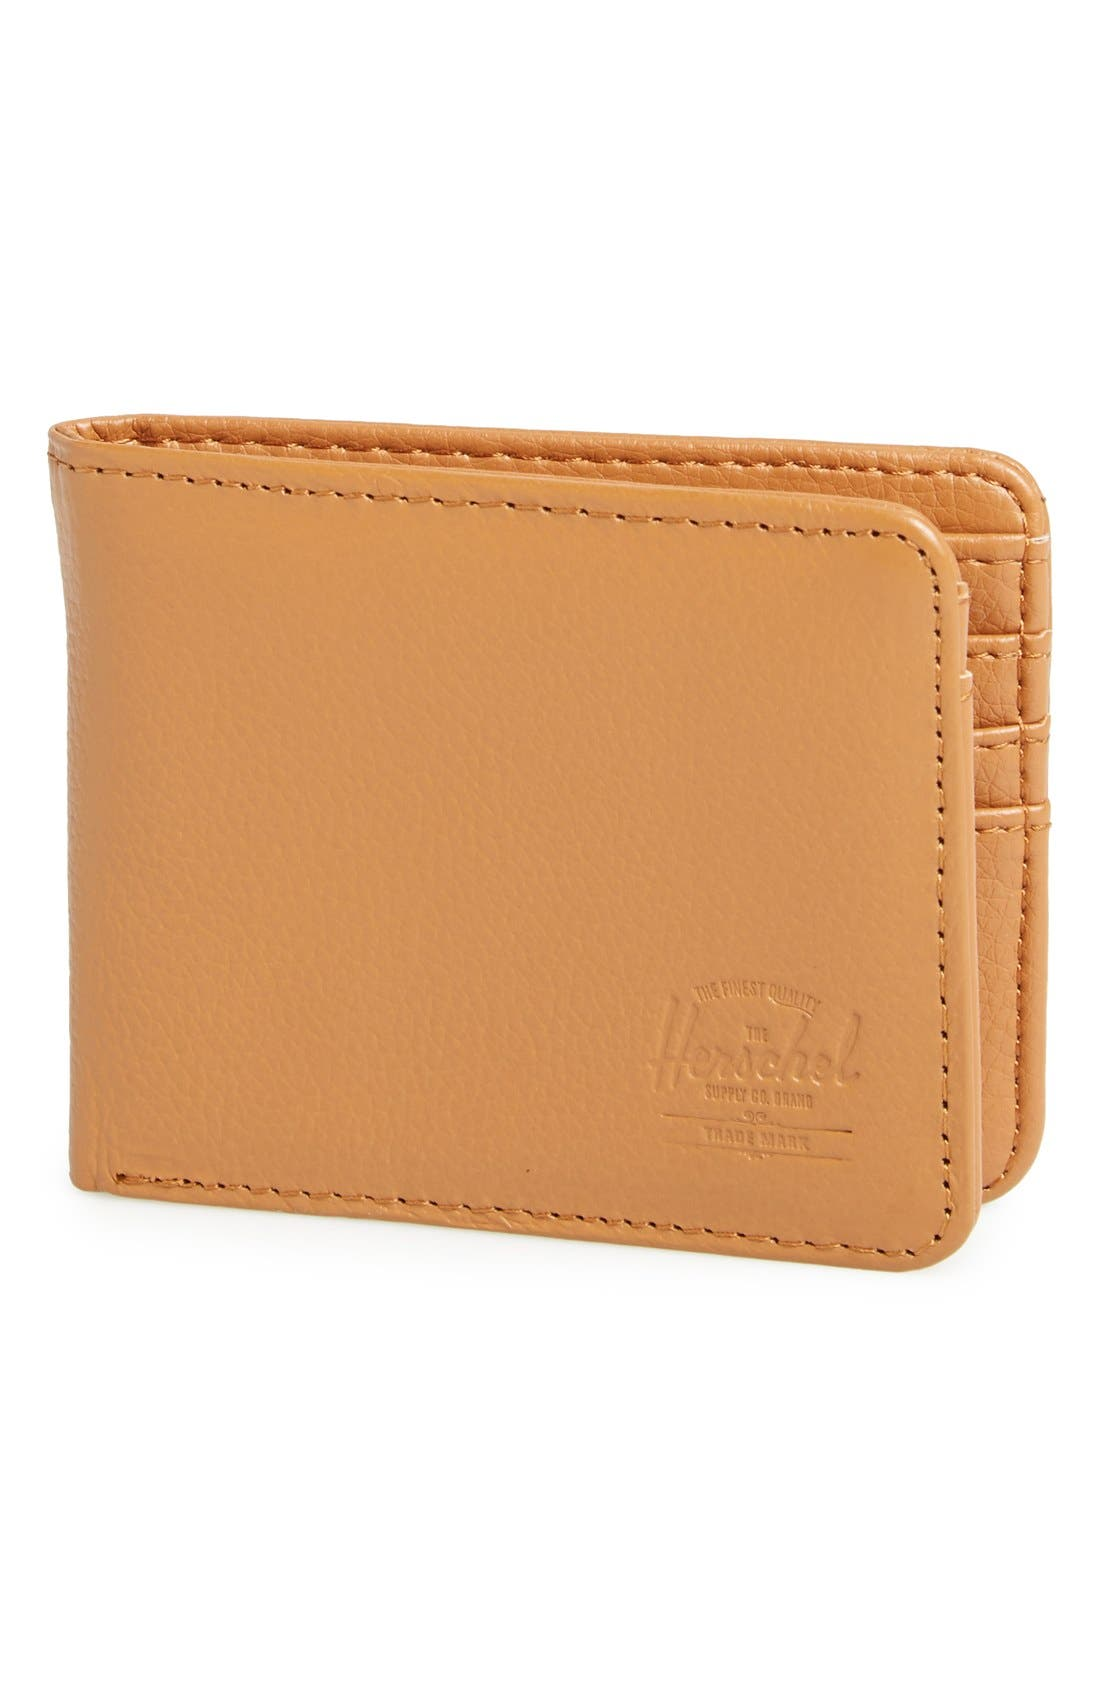 Herschel Supply Co. 'Hank' Leather Bifold Wallet